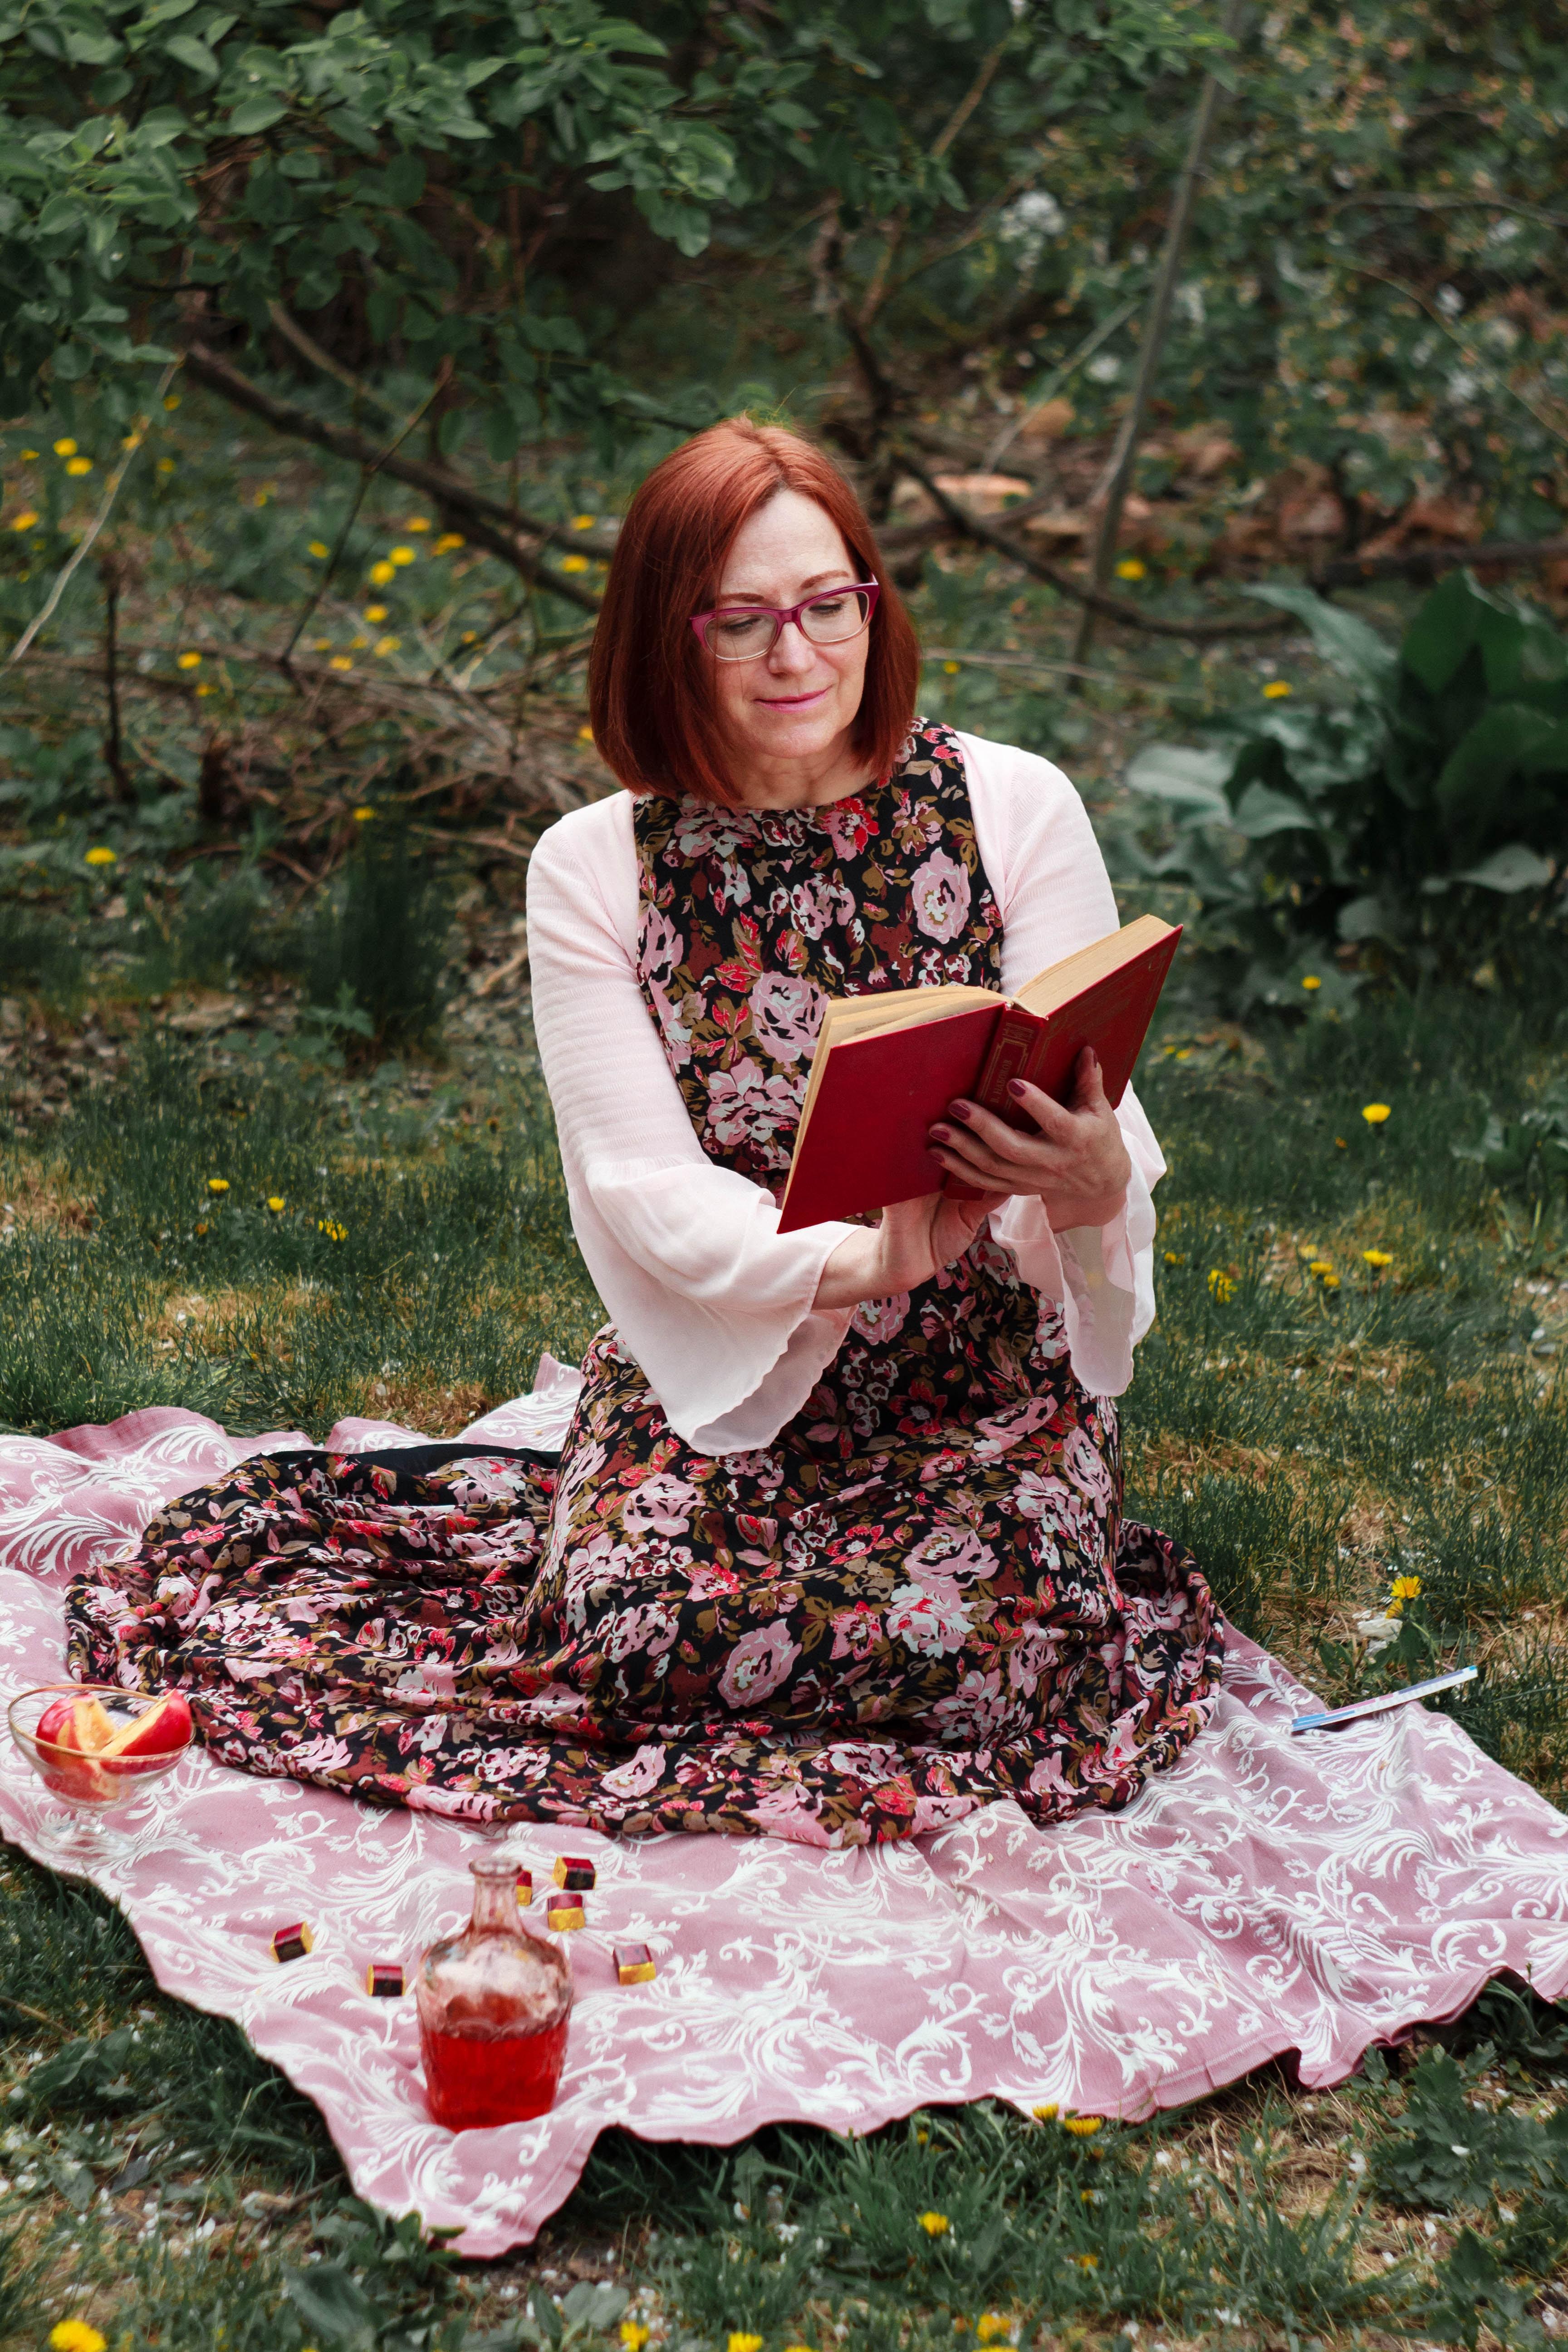 woman kneeling on floral mat on park